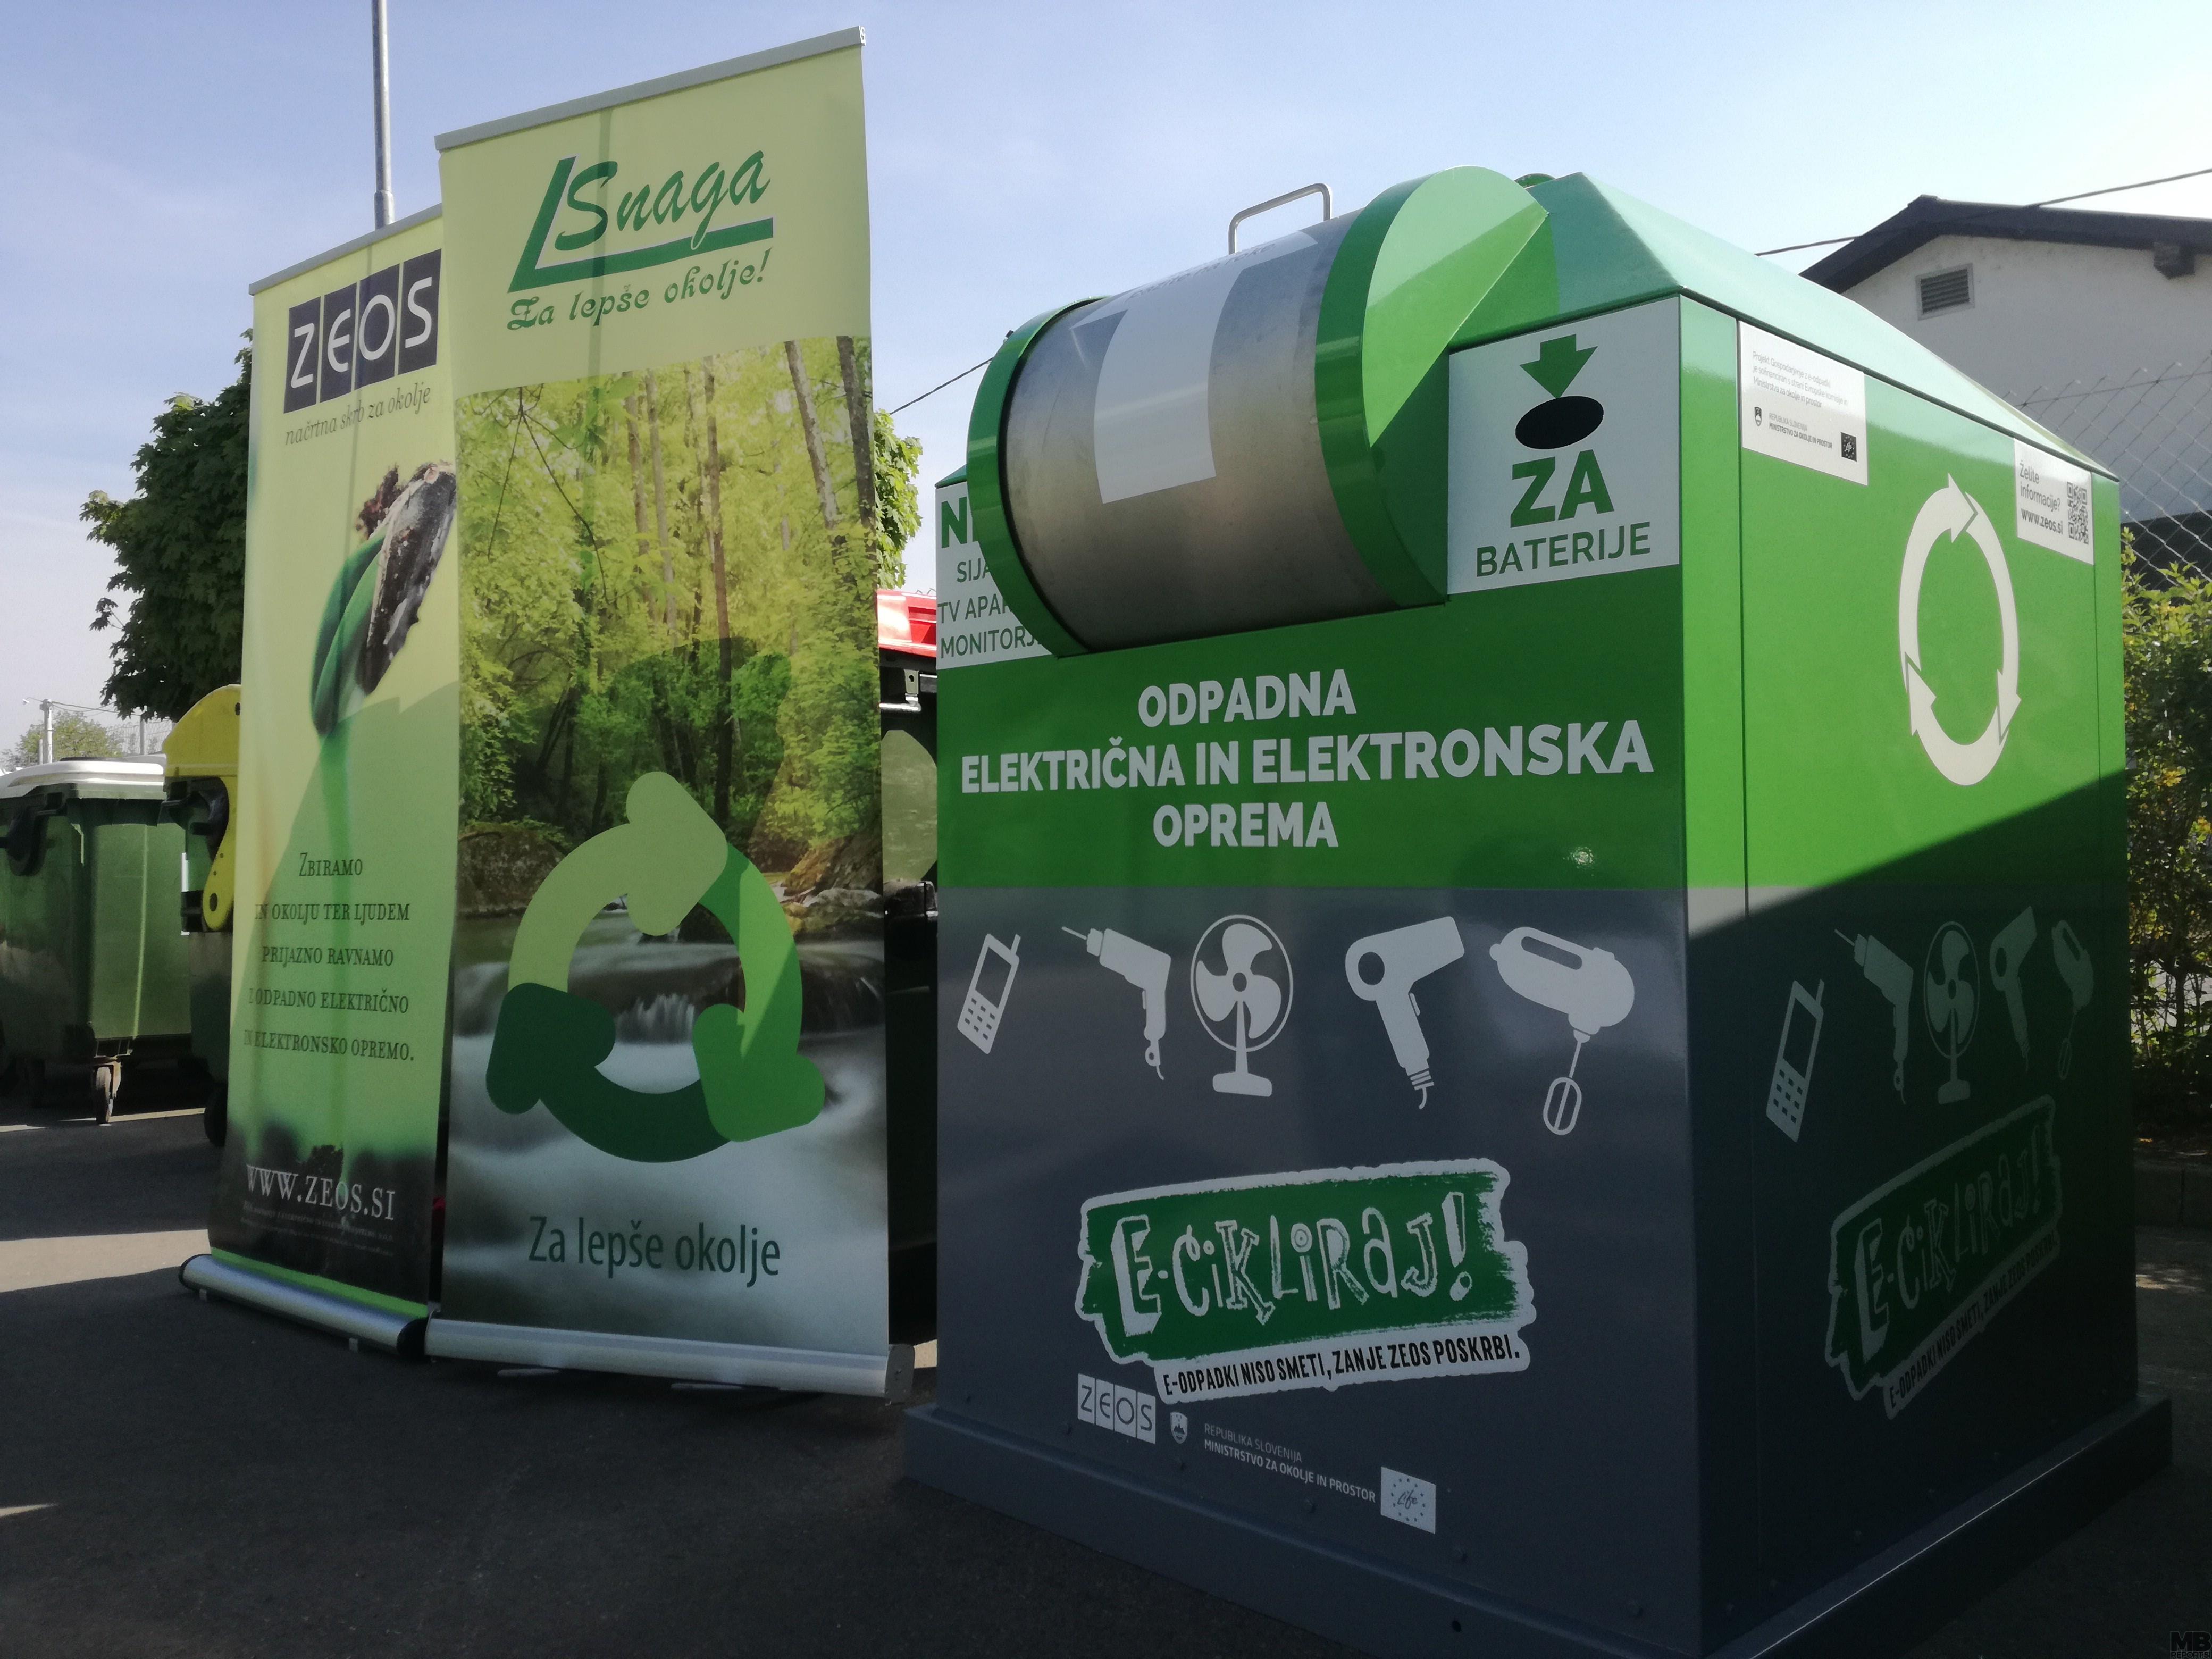 FOTO: V Mariboru bomo ločeno zbirali e-odpadke - MBREPORT.si